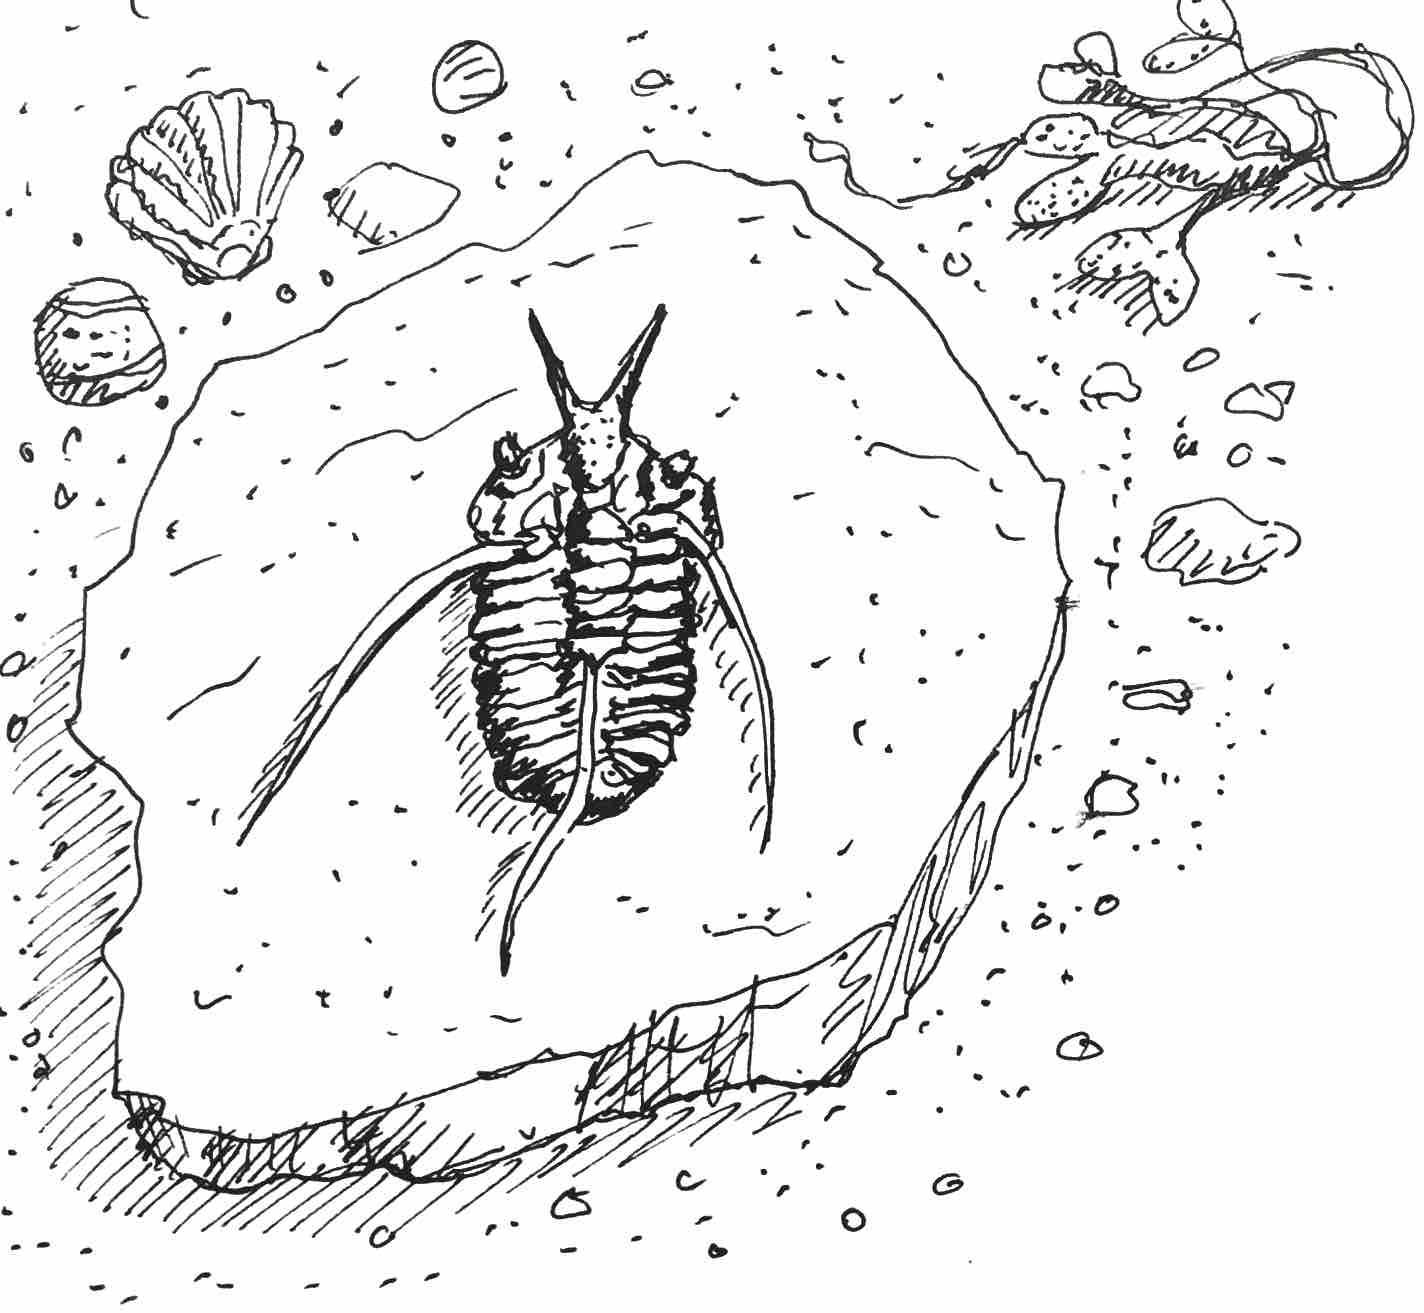 12 Trilobite.jpg